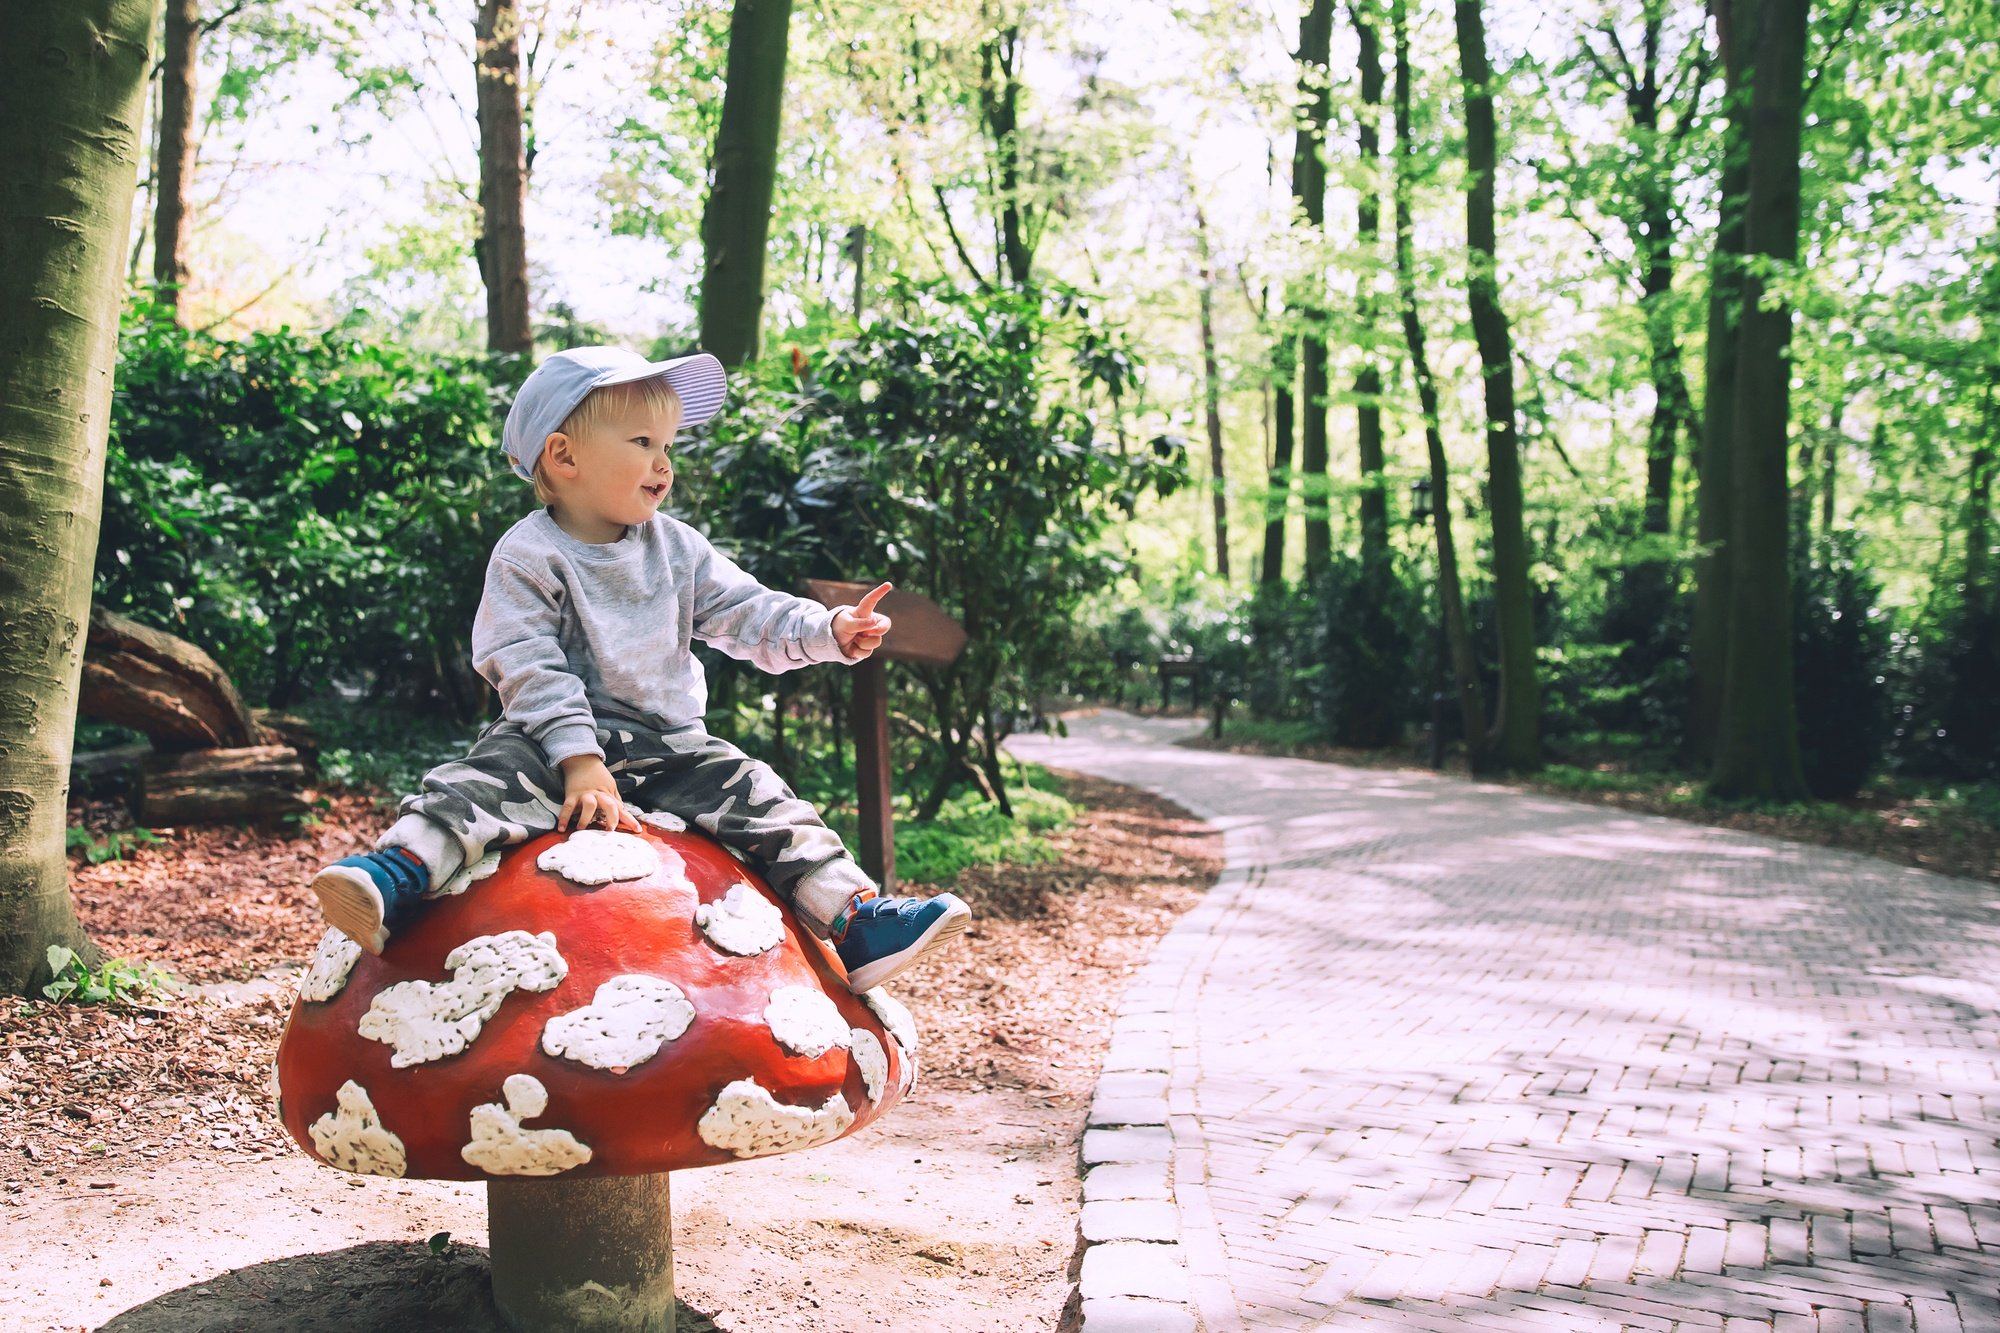 Child at Efteling Amusement Park in the Netherlands